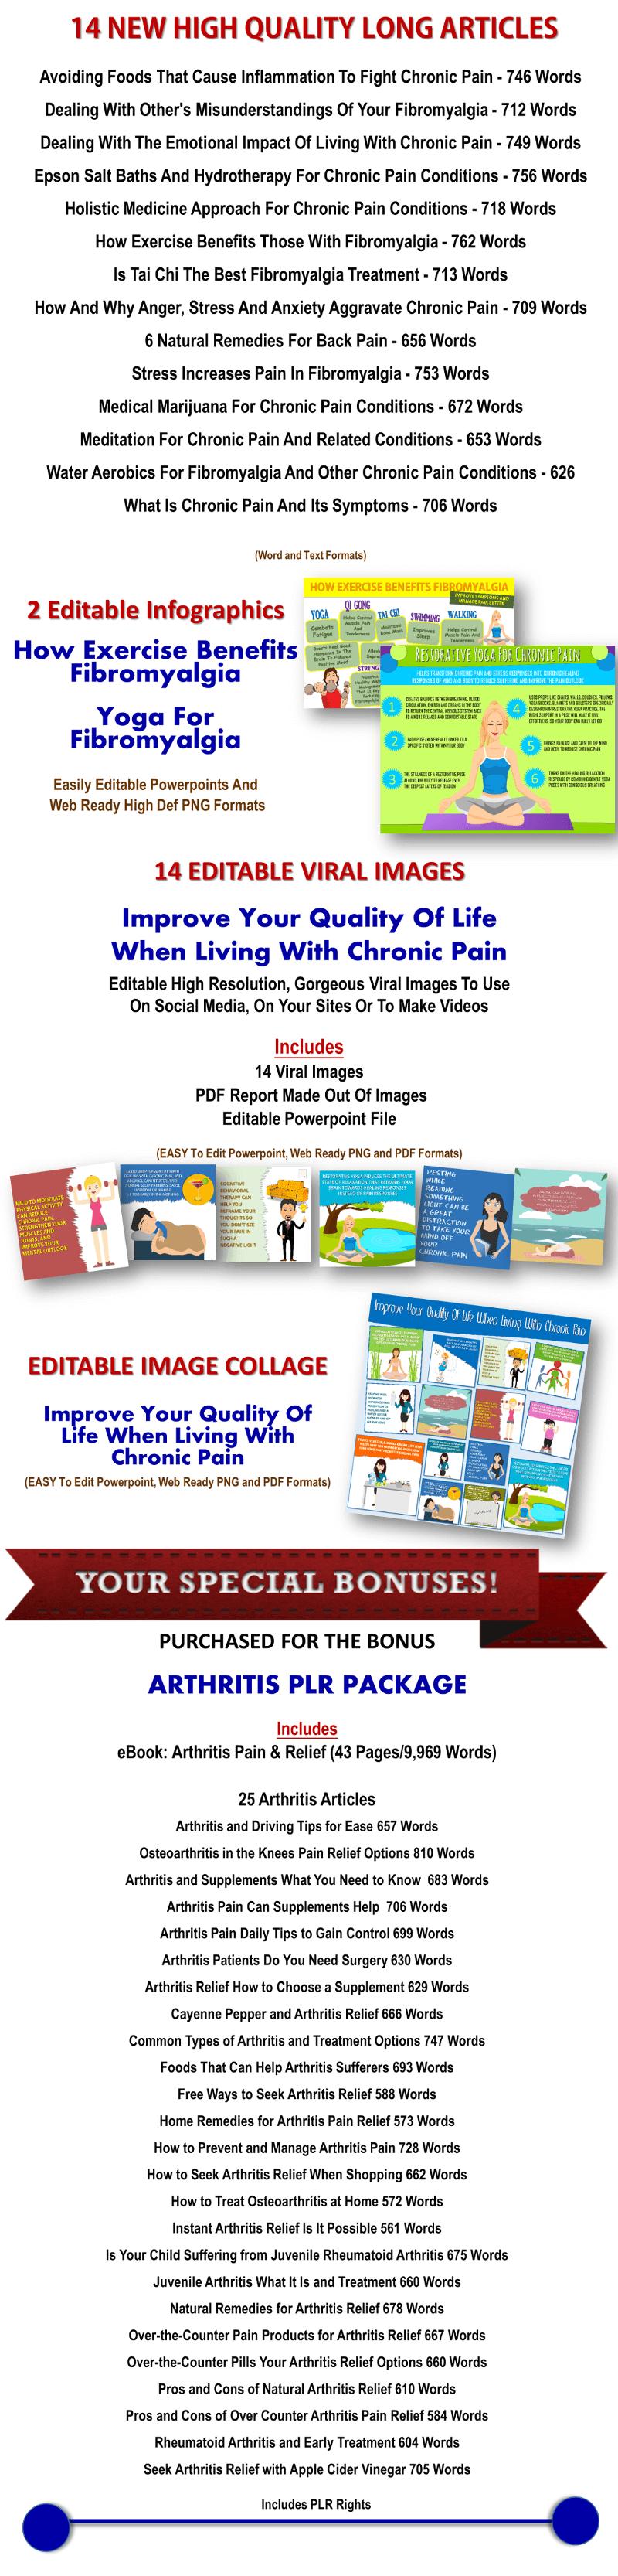 Giant Fibromyalgia/Chronic Pain PLR Pack